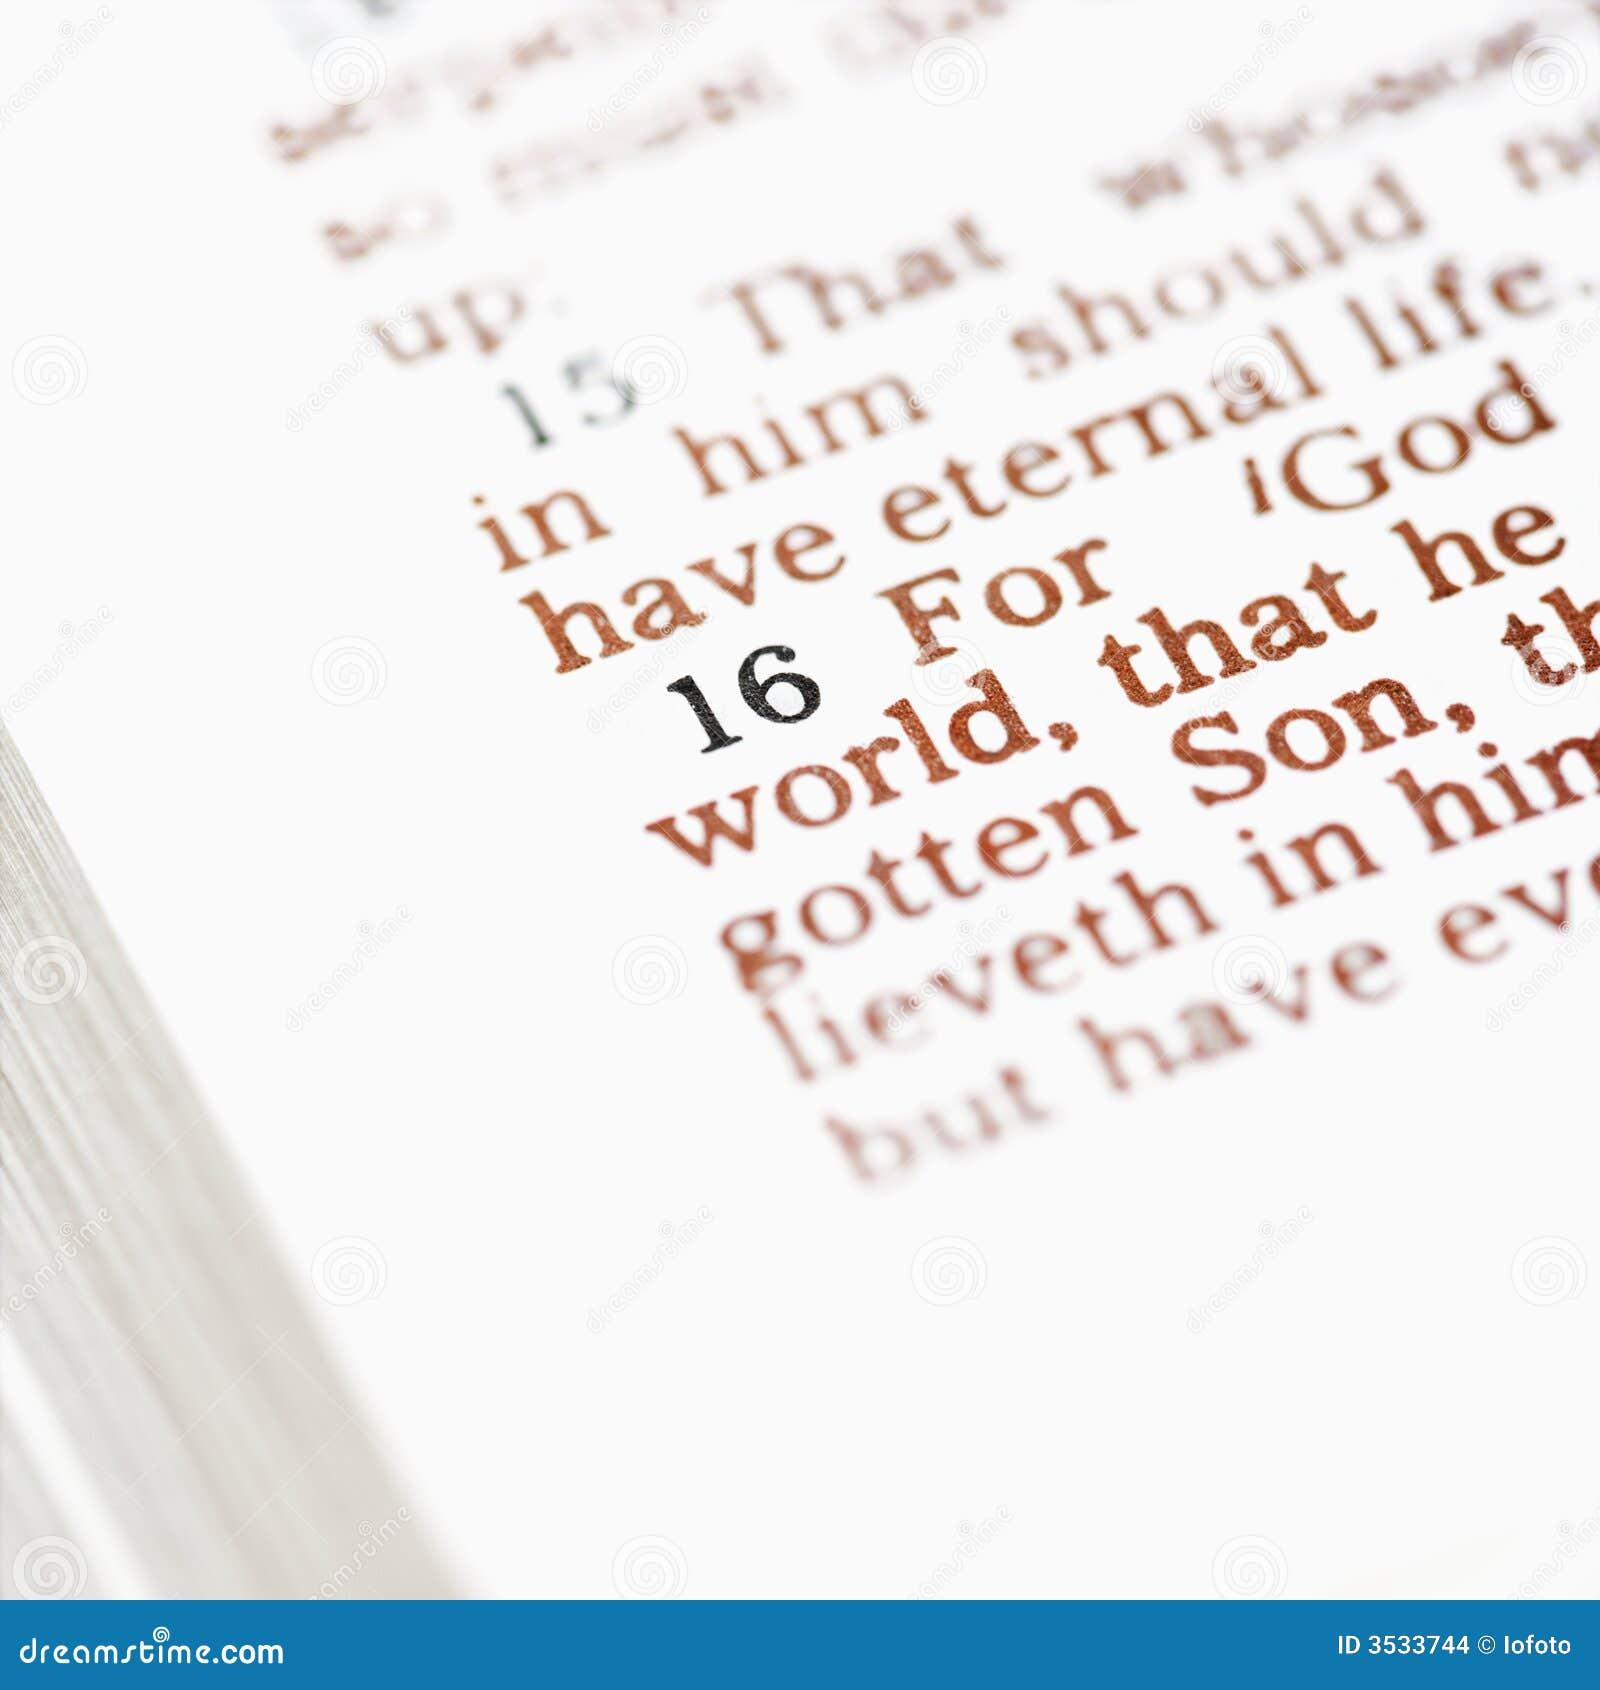 Biblia cristiana.